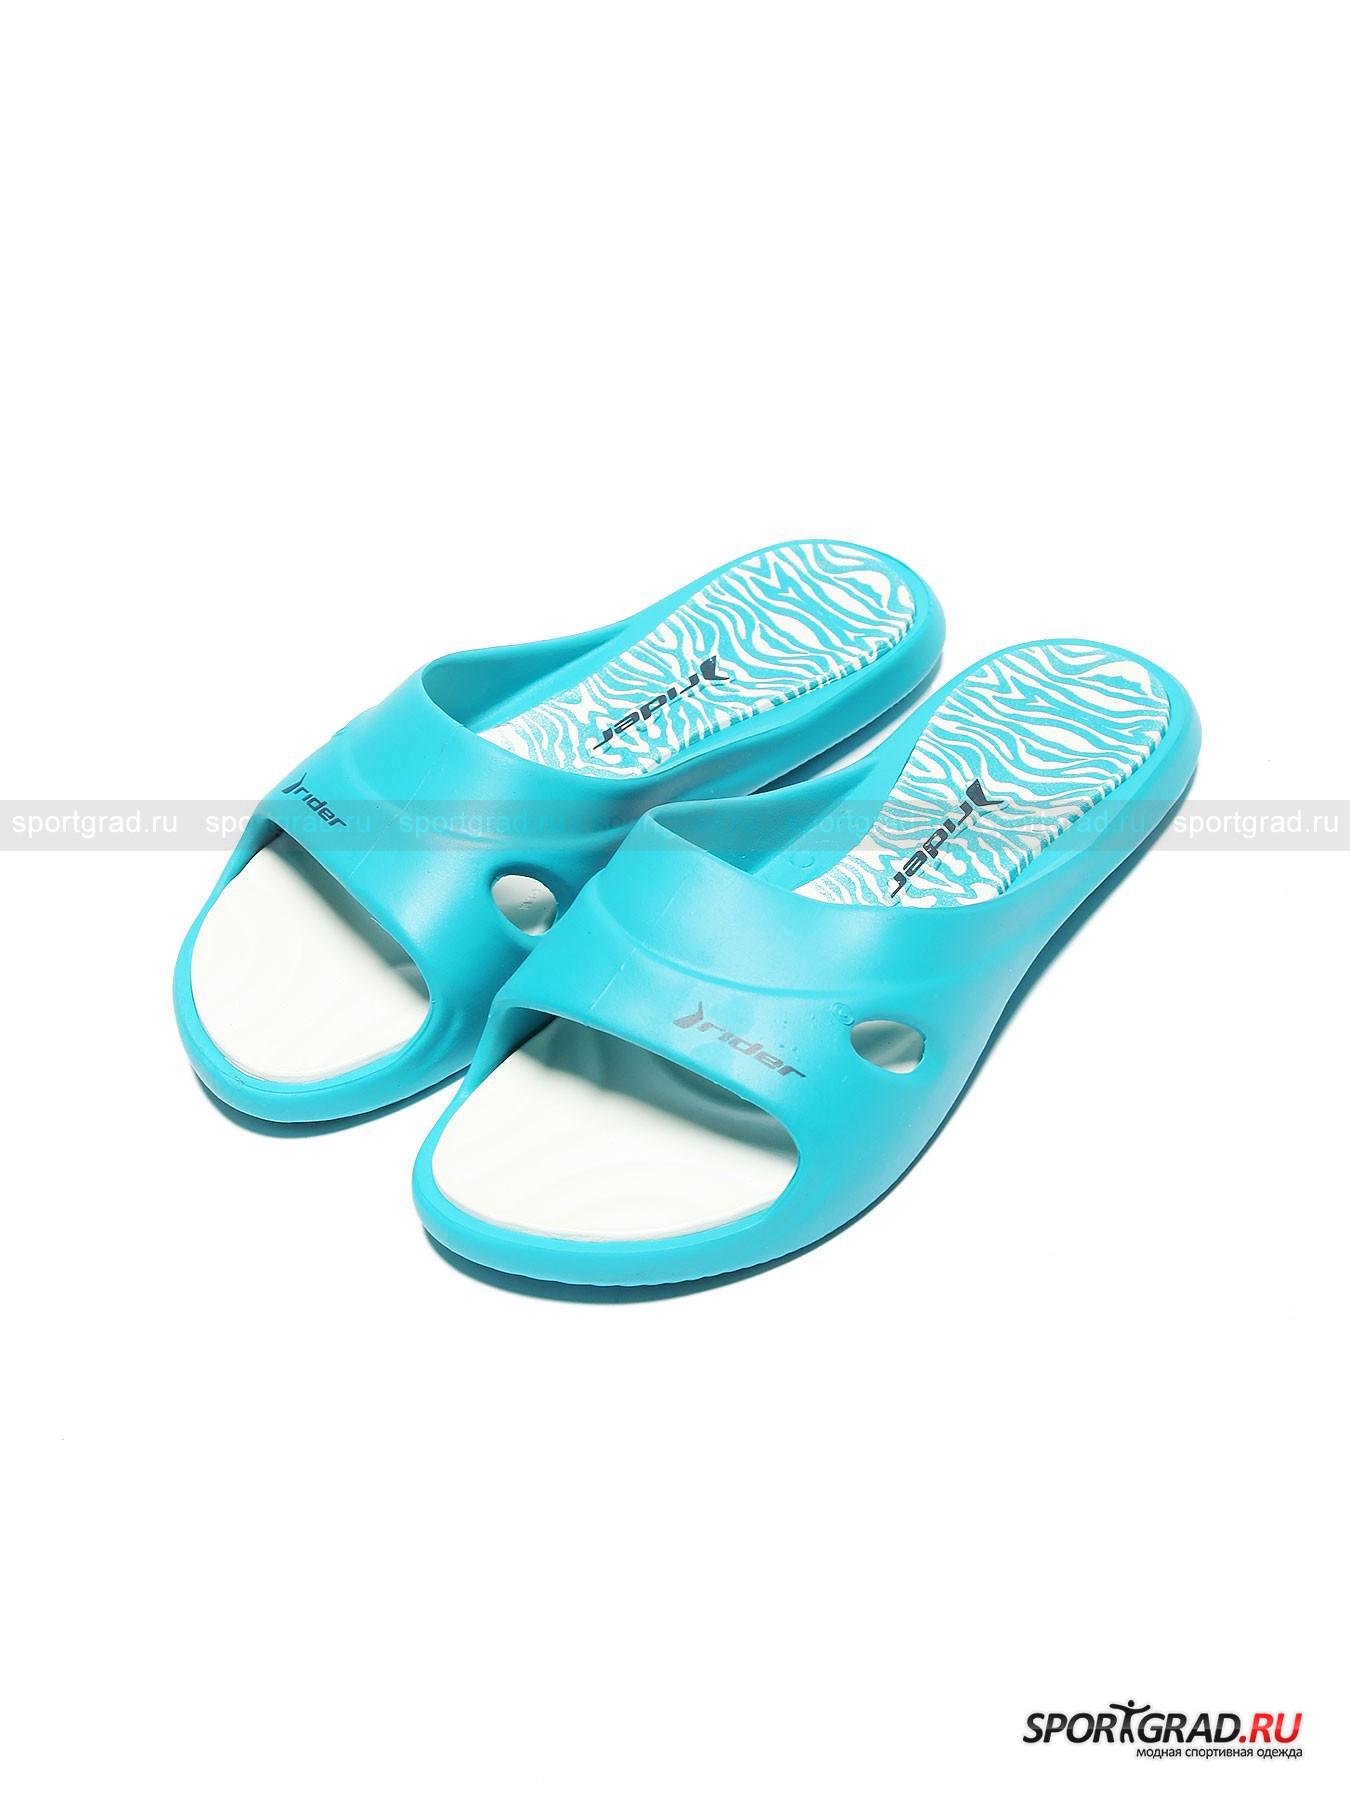 ������ ������� Slide Feet RIDER